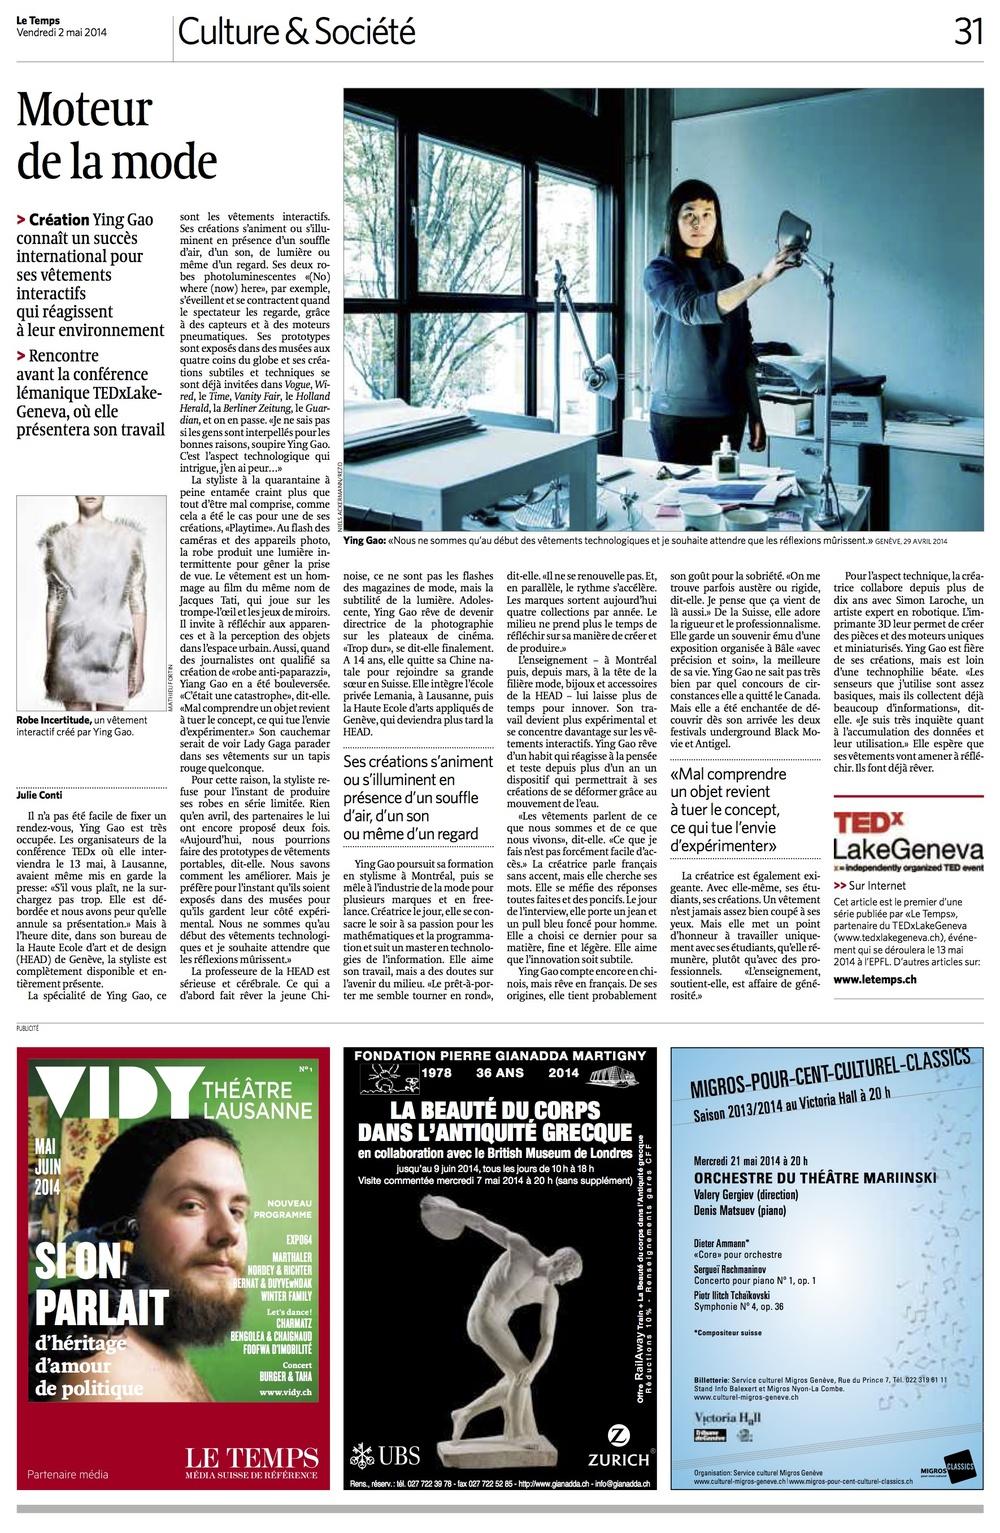 Le Temps 02 mai 2014.jpg